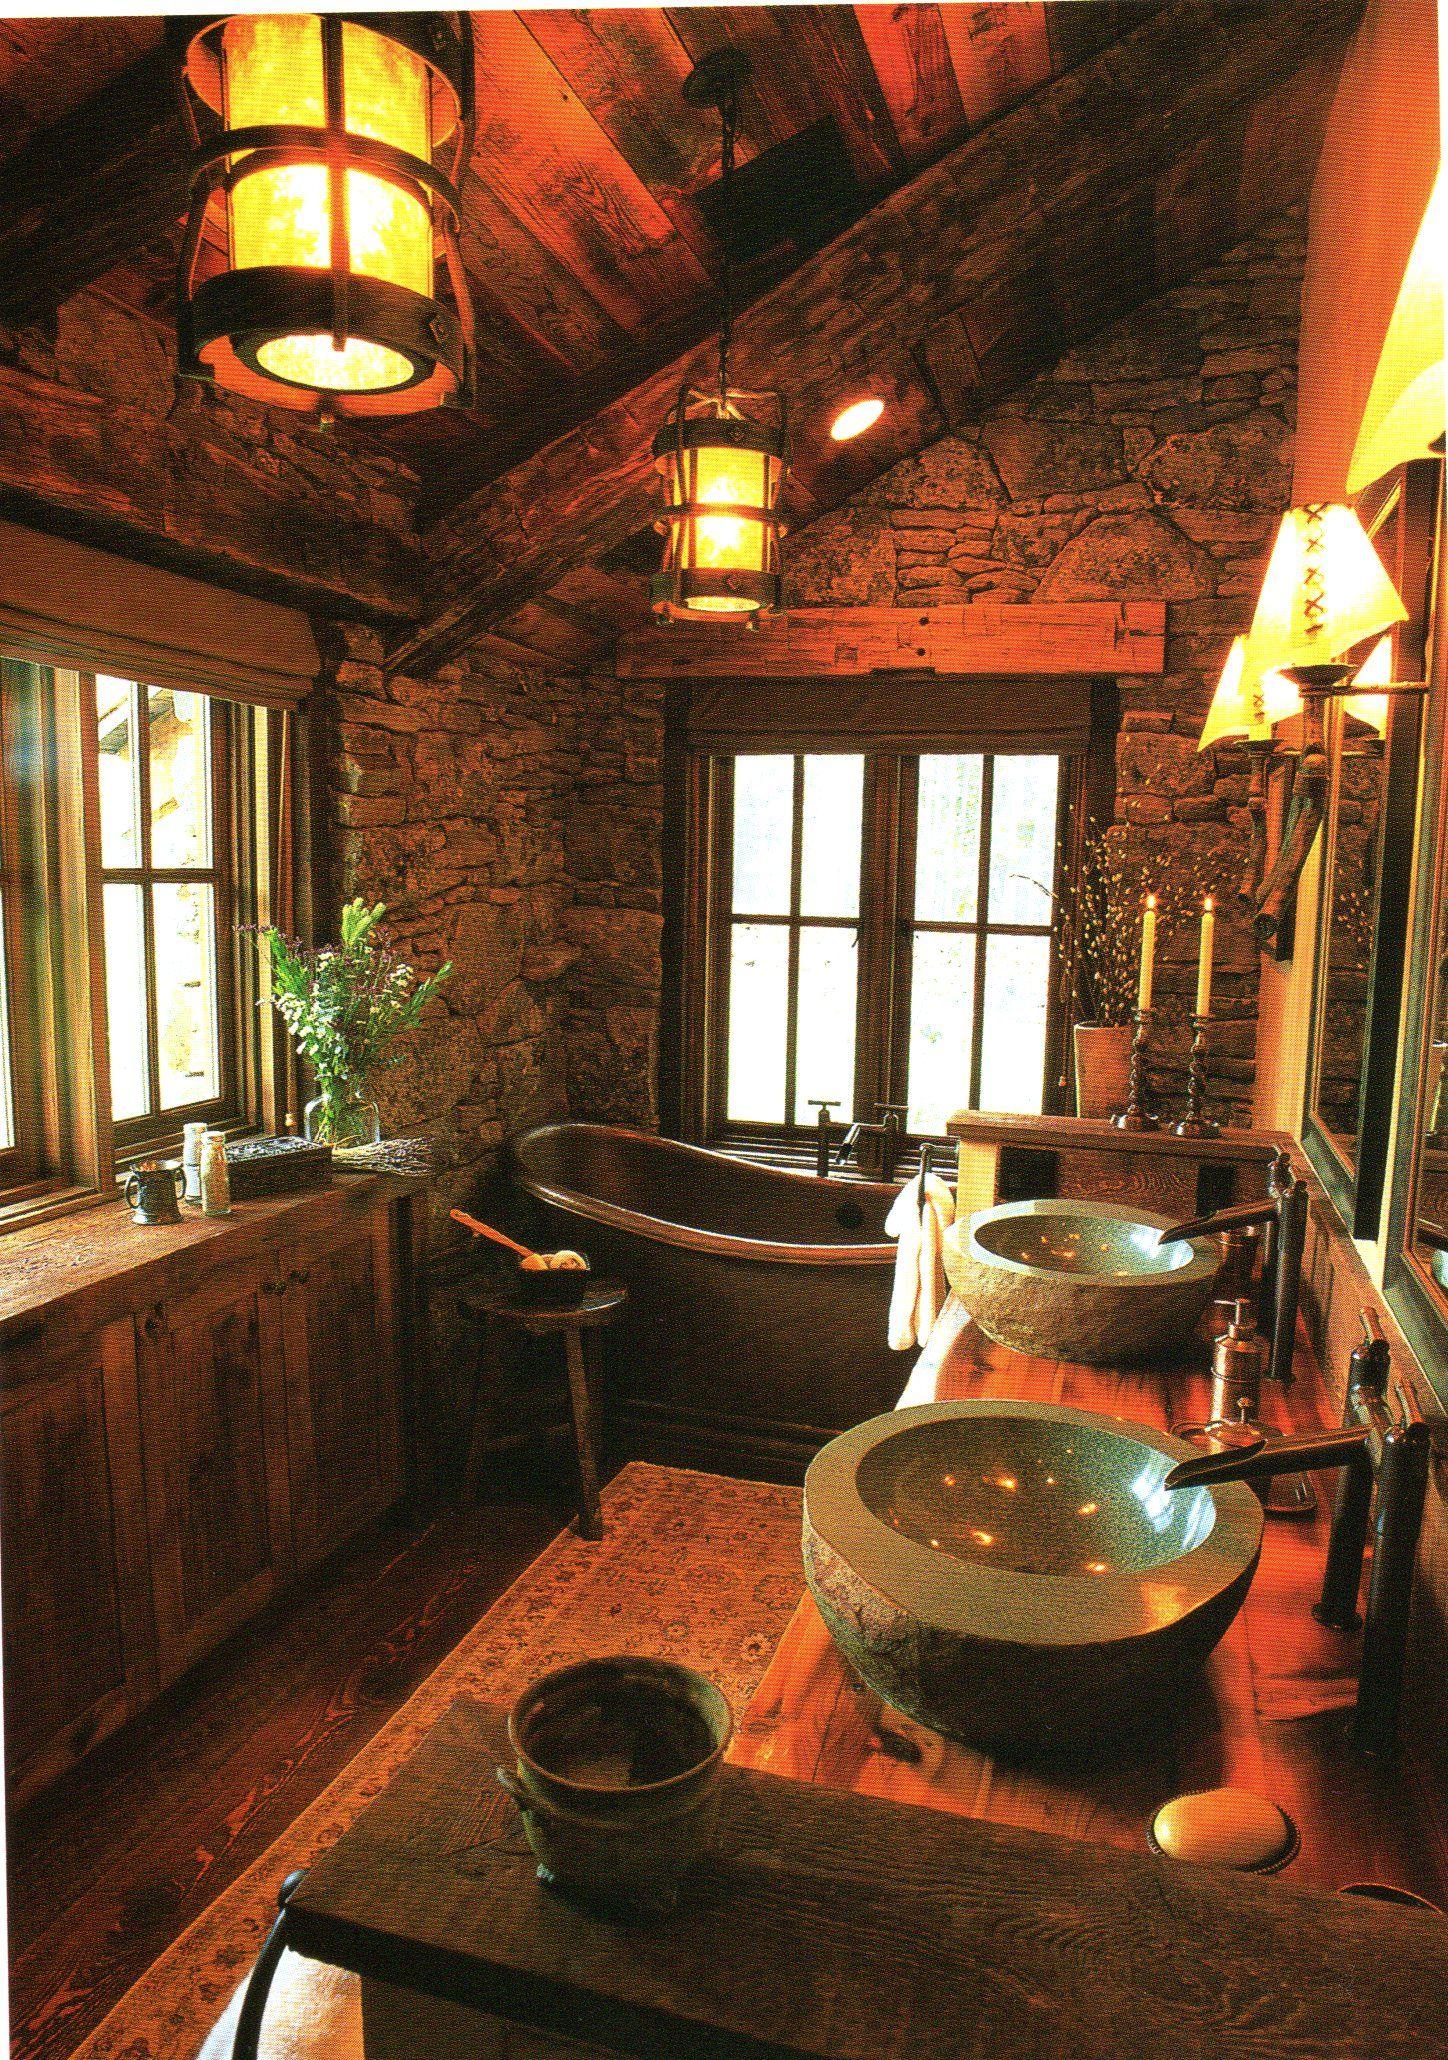 30 Bathroom Sets Design Ideas with